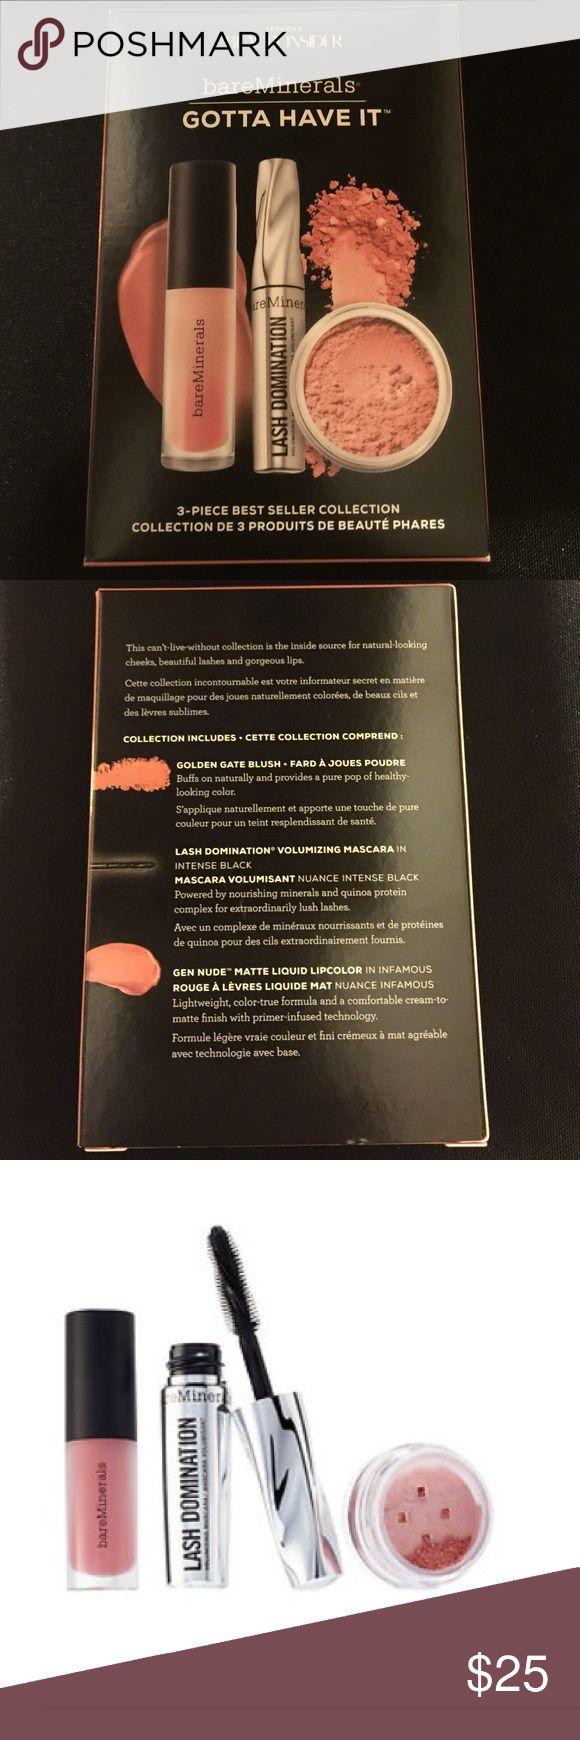 Bare Minerals Set: Matte LipStick, Mascara, Blush Bare Minerals Set: Matte LipStick Gen Nude, Las Domination Mascara, Golden Gate Blush, Brand New. Authentic. Sephora Makeup